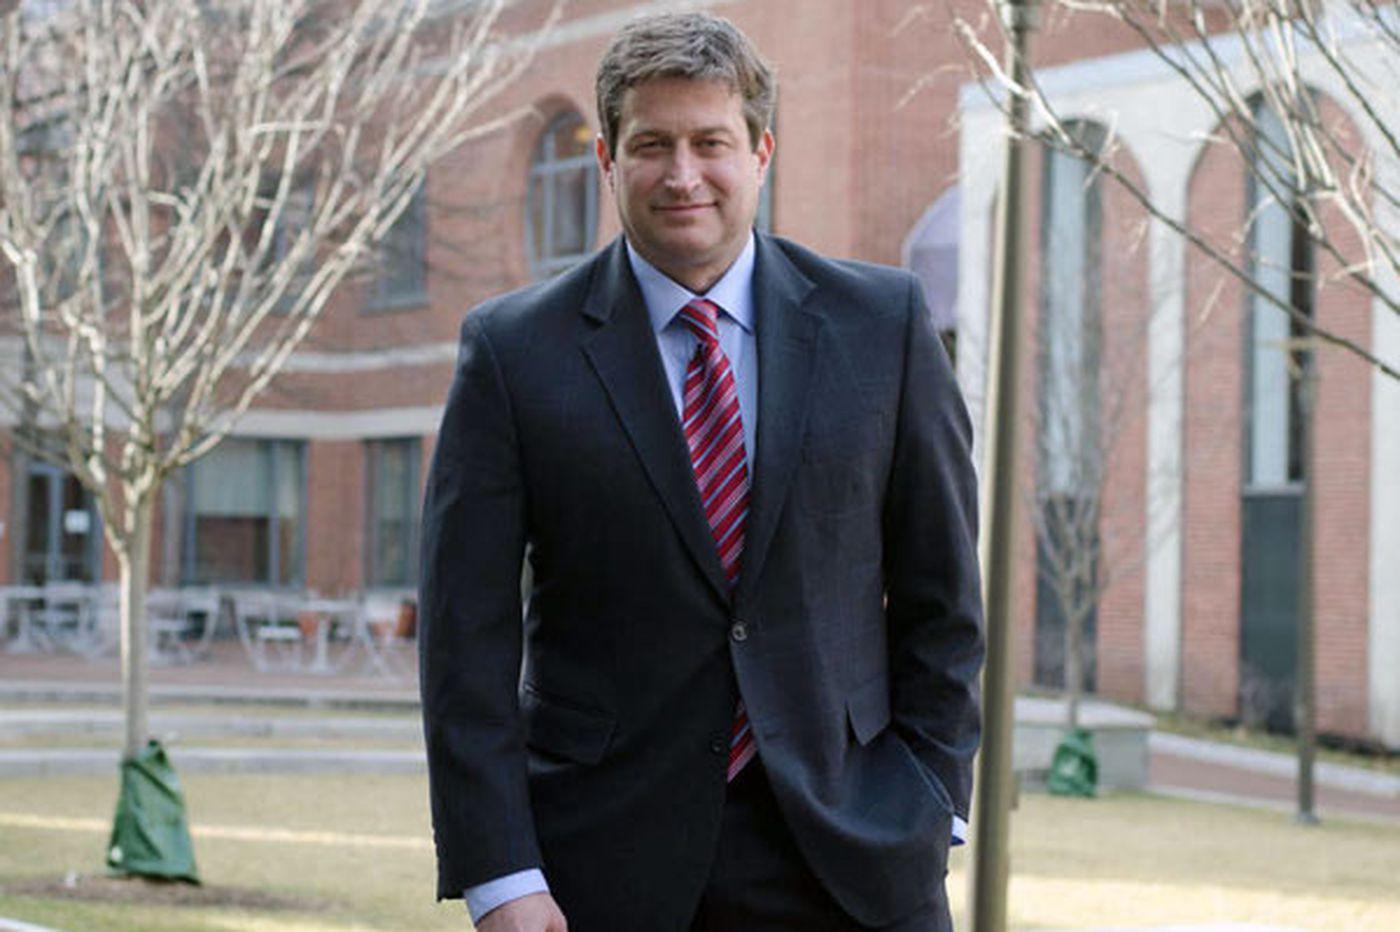 New Penn law school dean has grip on complexity